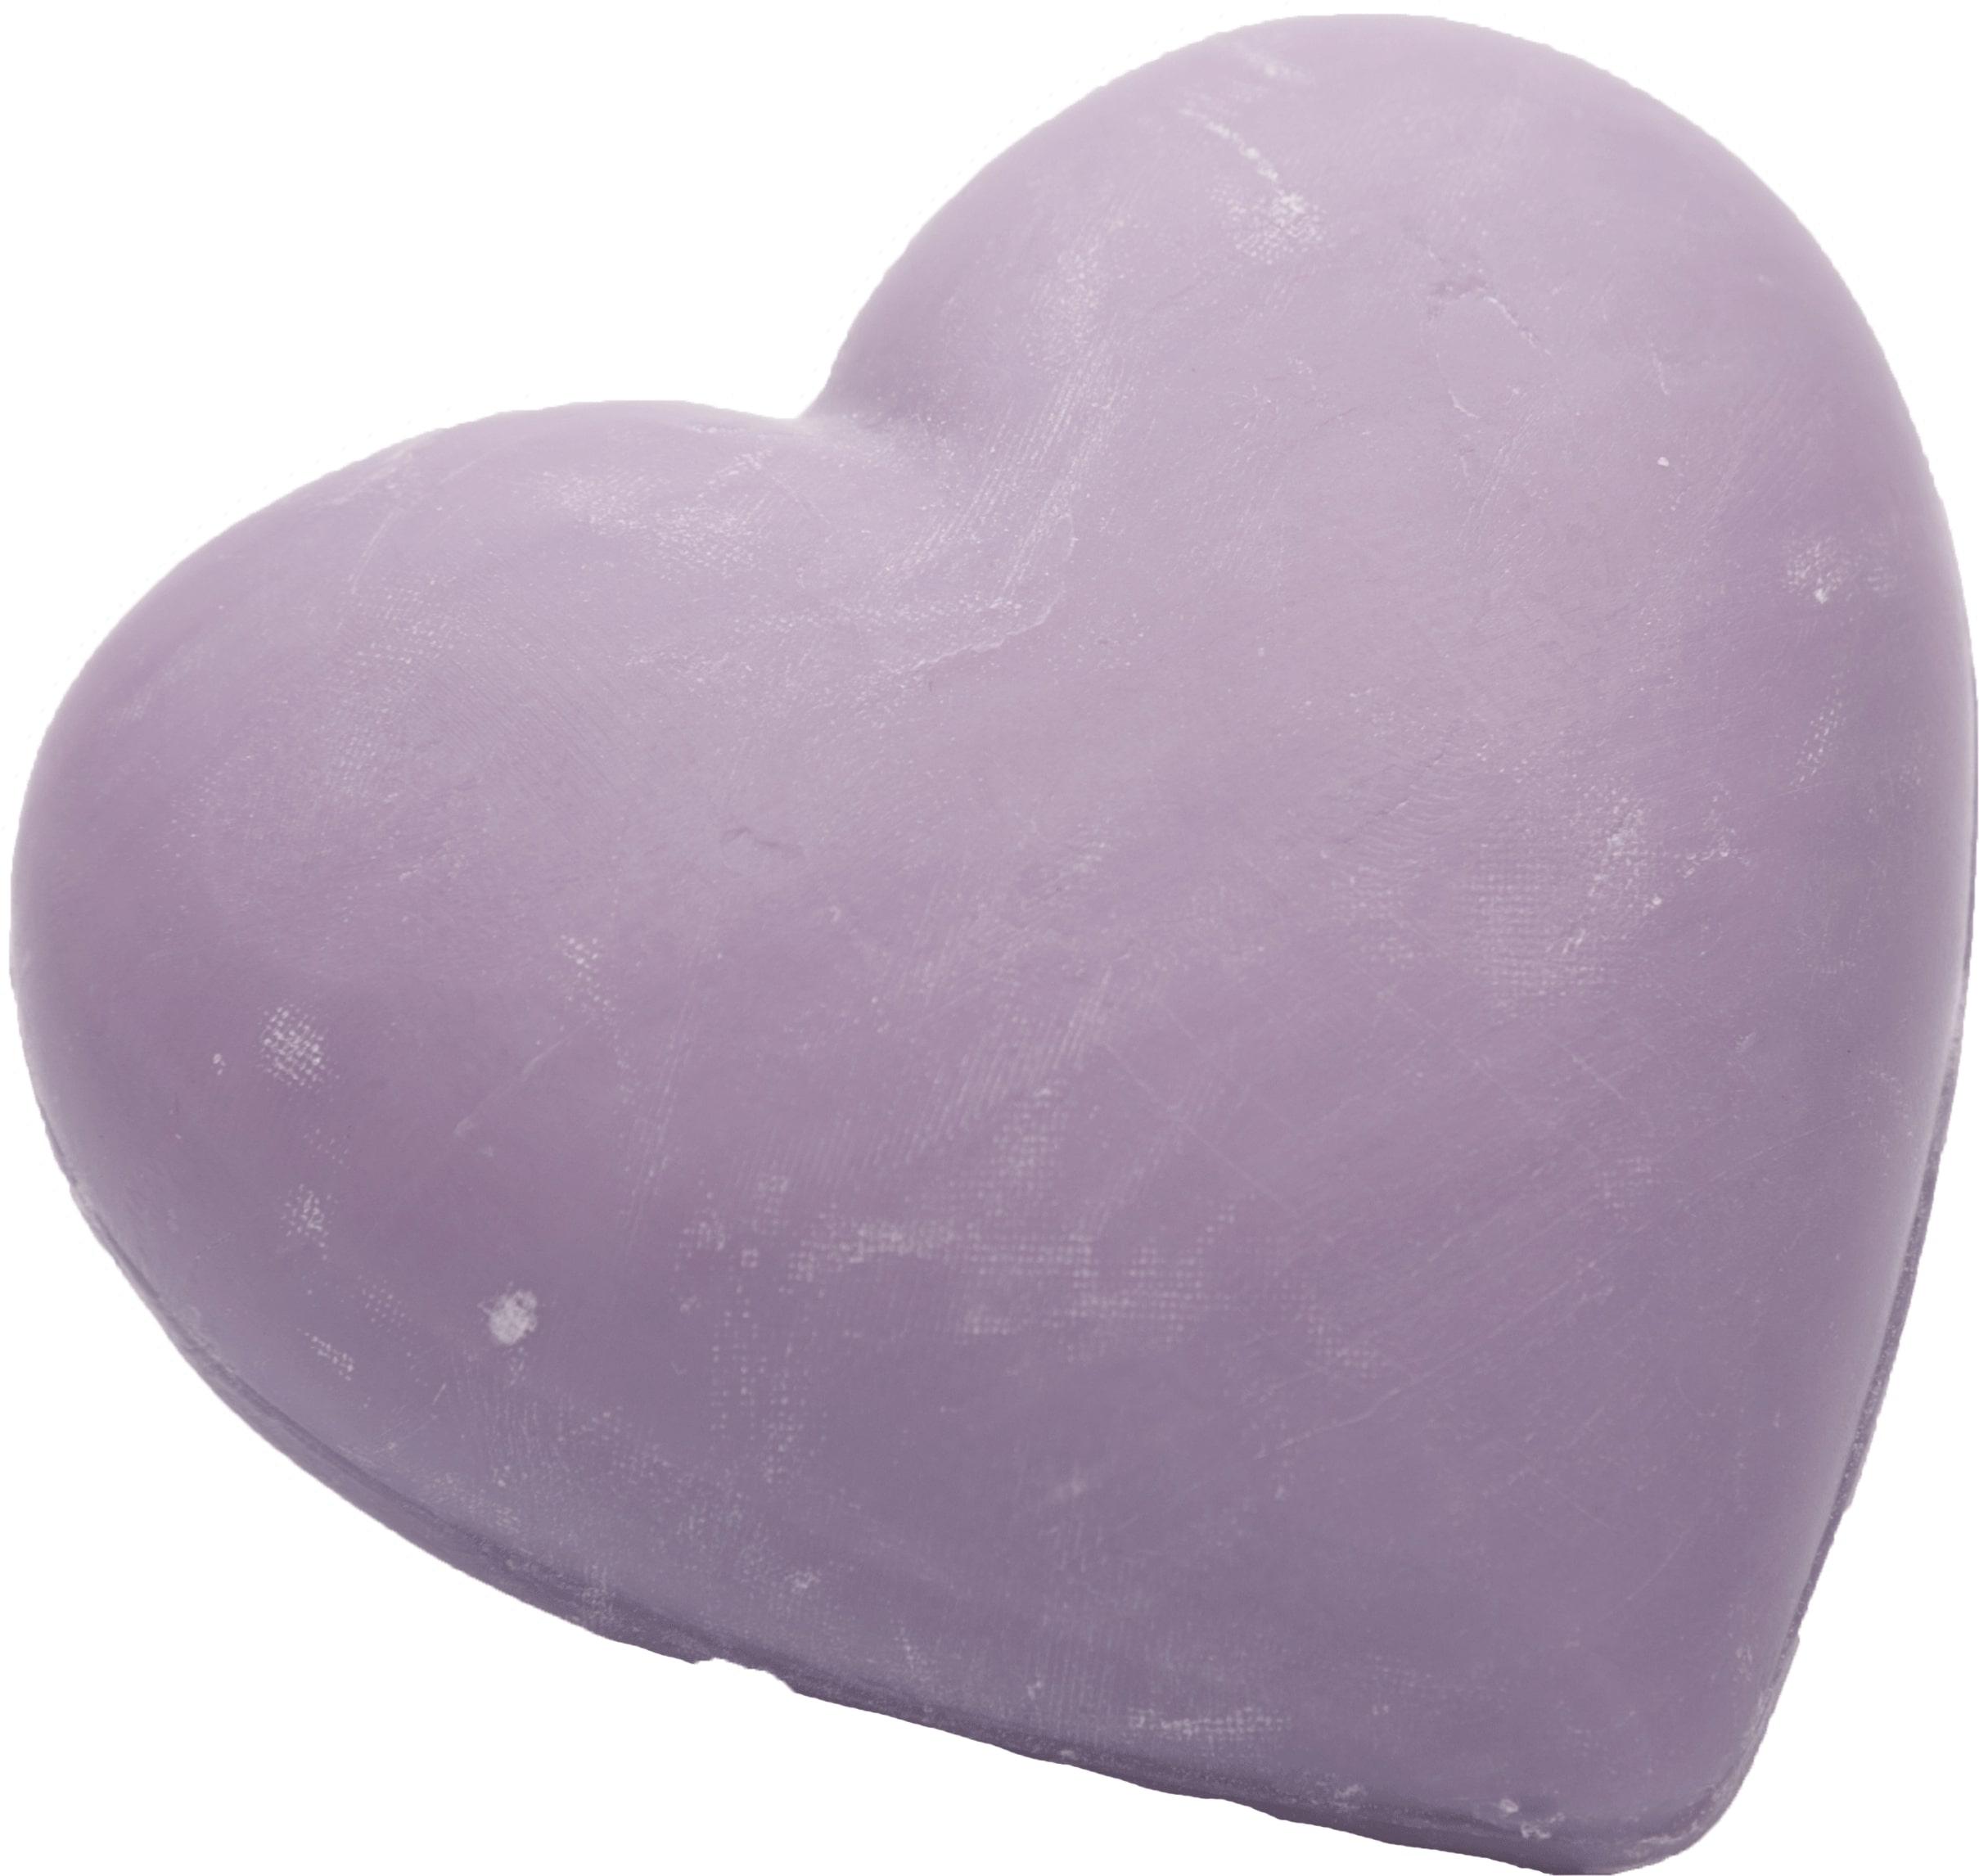 Seife in Herzform 100g - Lavendel